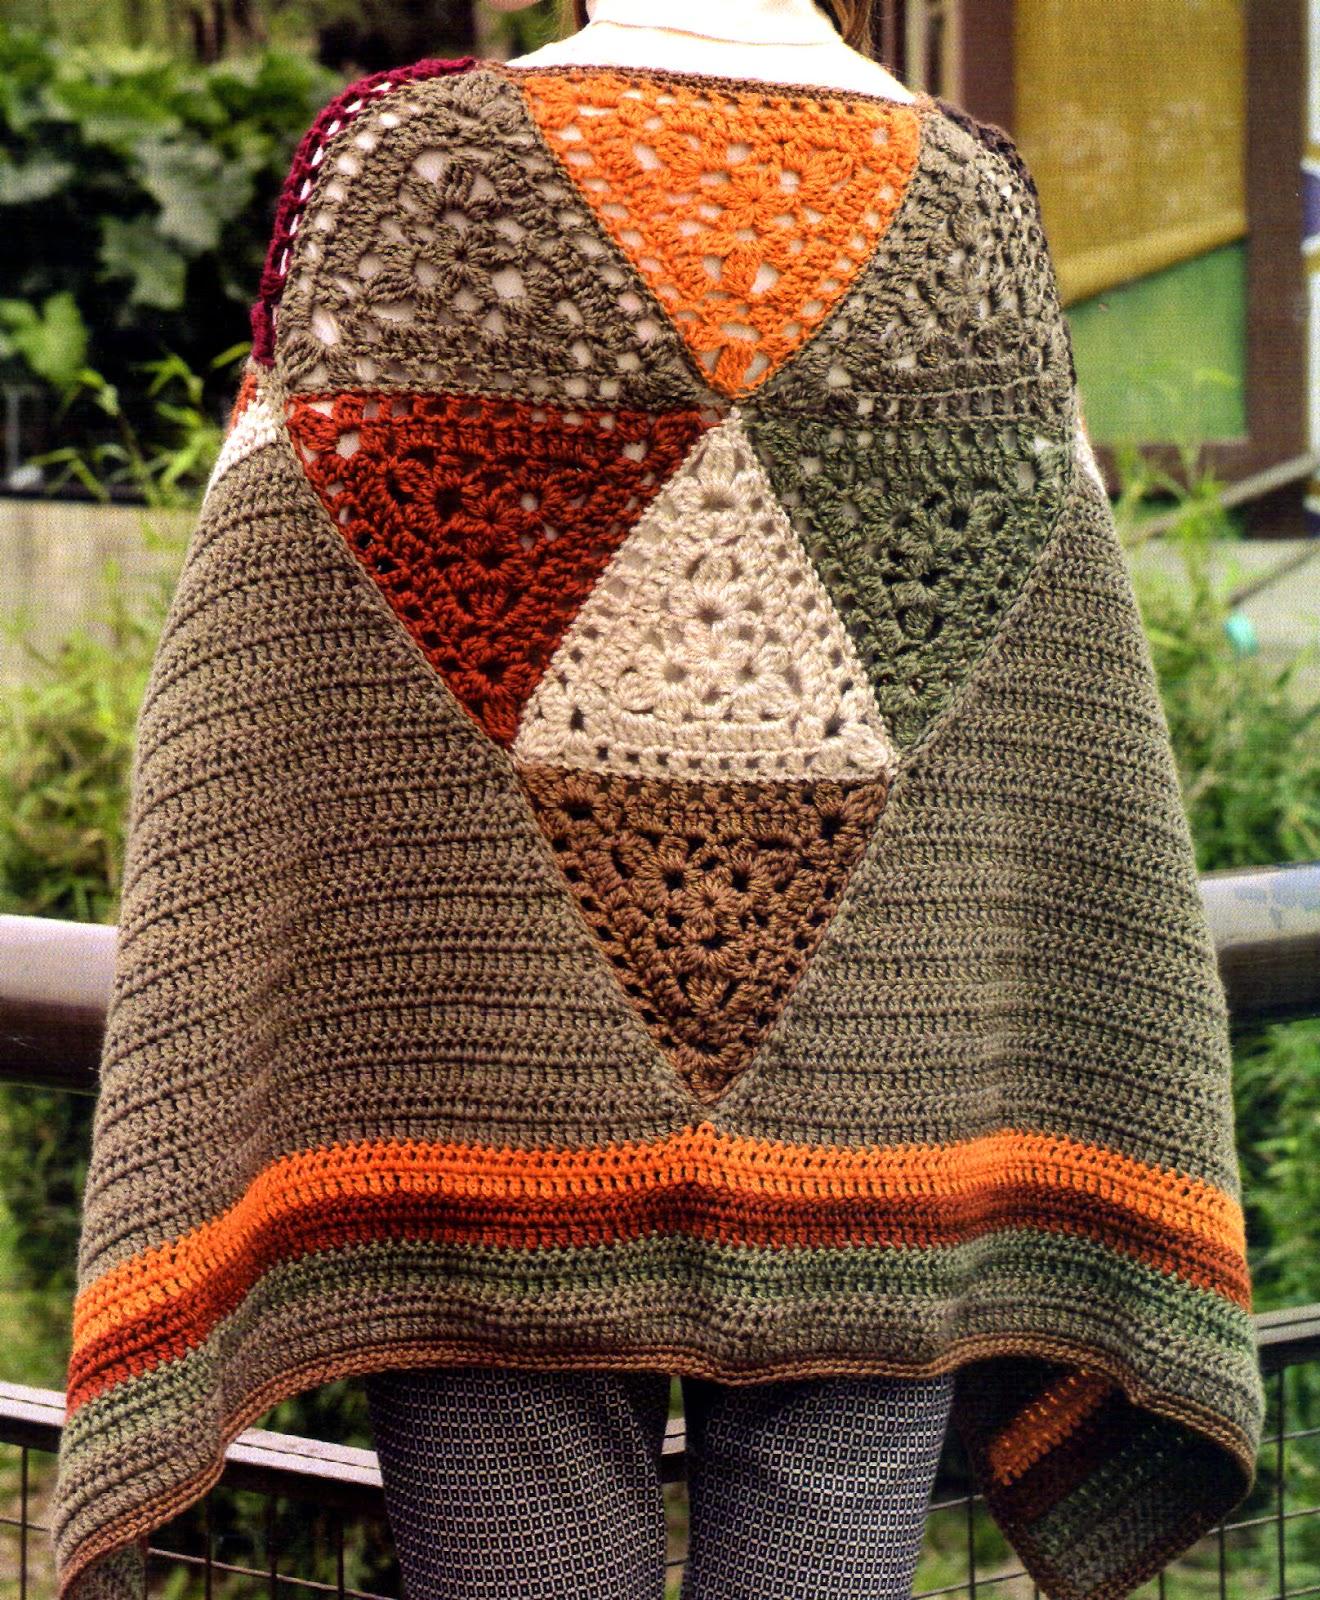 tejidos artesanales en crochet poncho vintage tejido en crochet. Black Bedroom Furniture Sets. Home Design Ideas